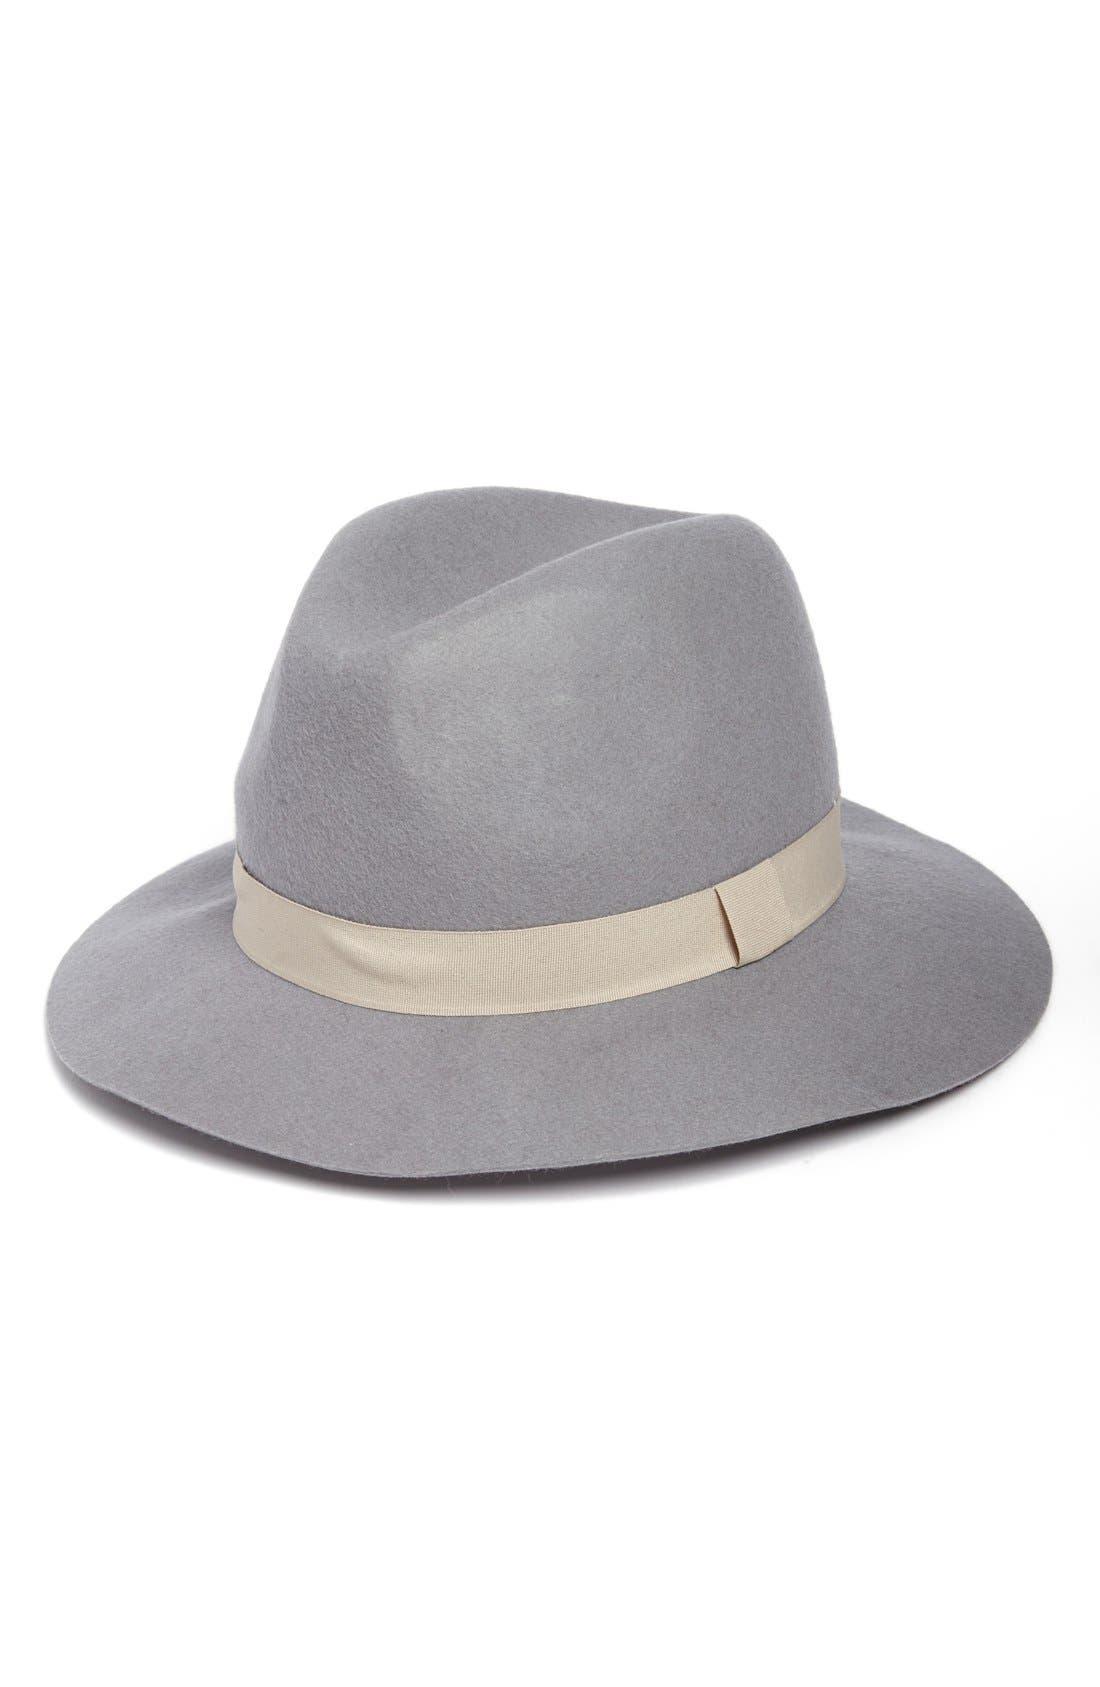 Felt Fedora,                         Main,                         color, Grey